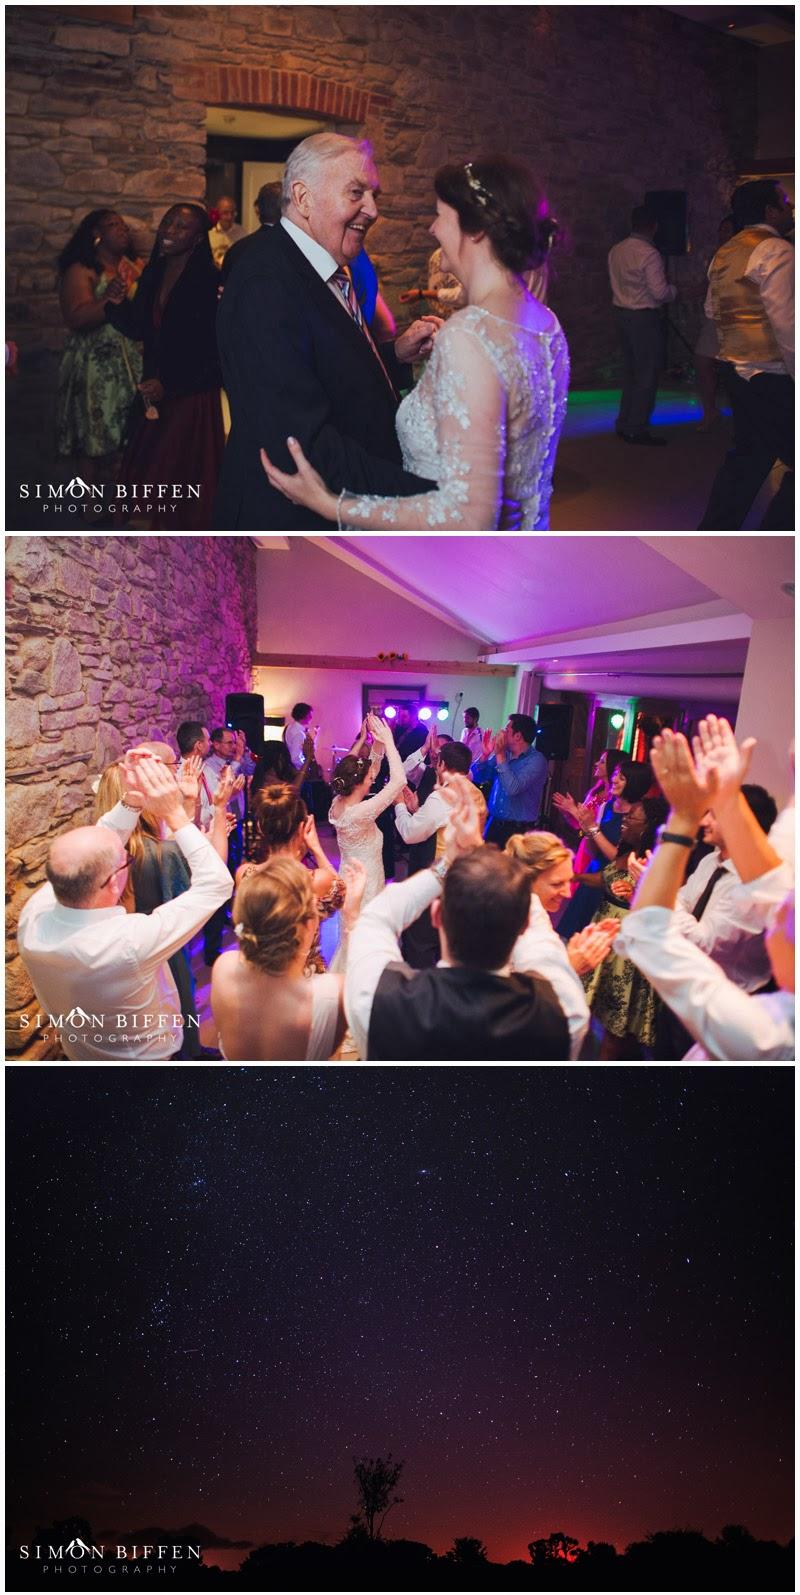 Wedding dancing at Trevenna Cornwall